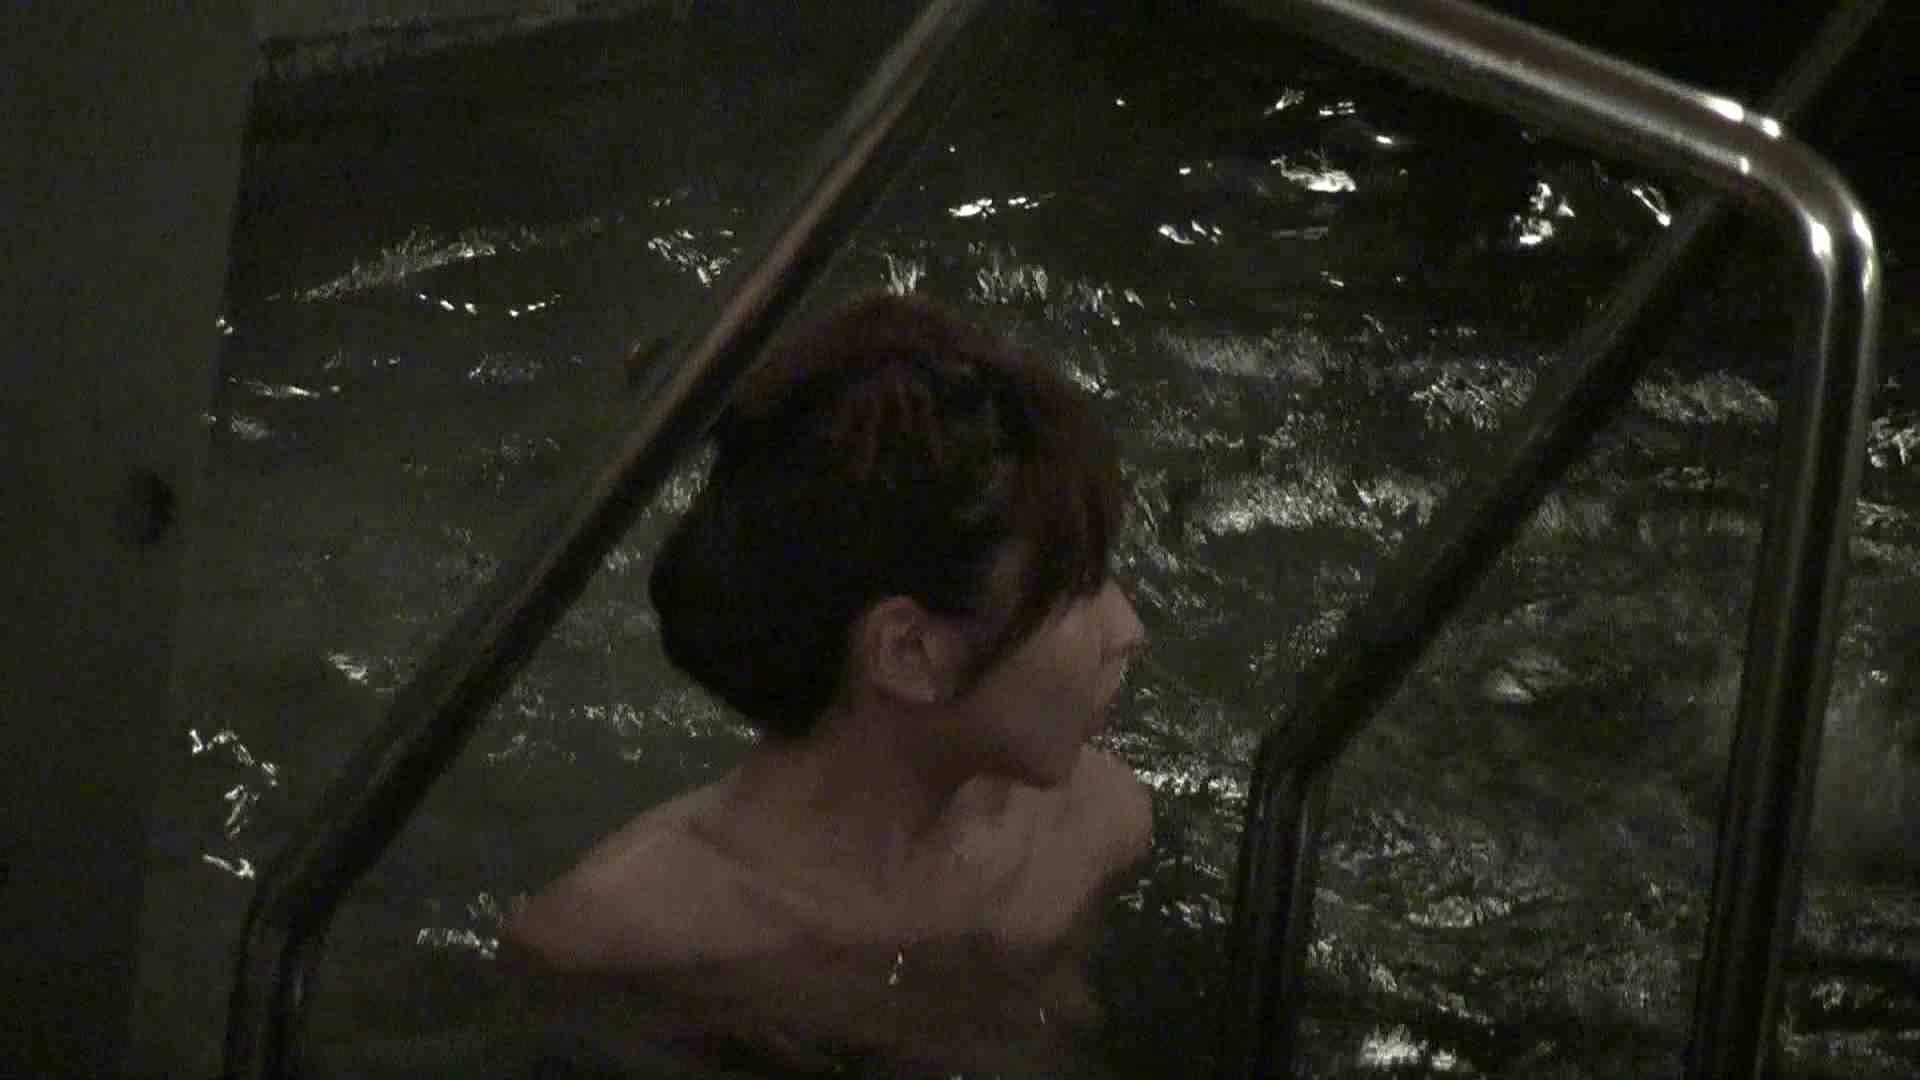 Aquaな露天風呂Vol.410 露天風呂編 | 盗撮シリーズ  94PIX 89